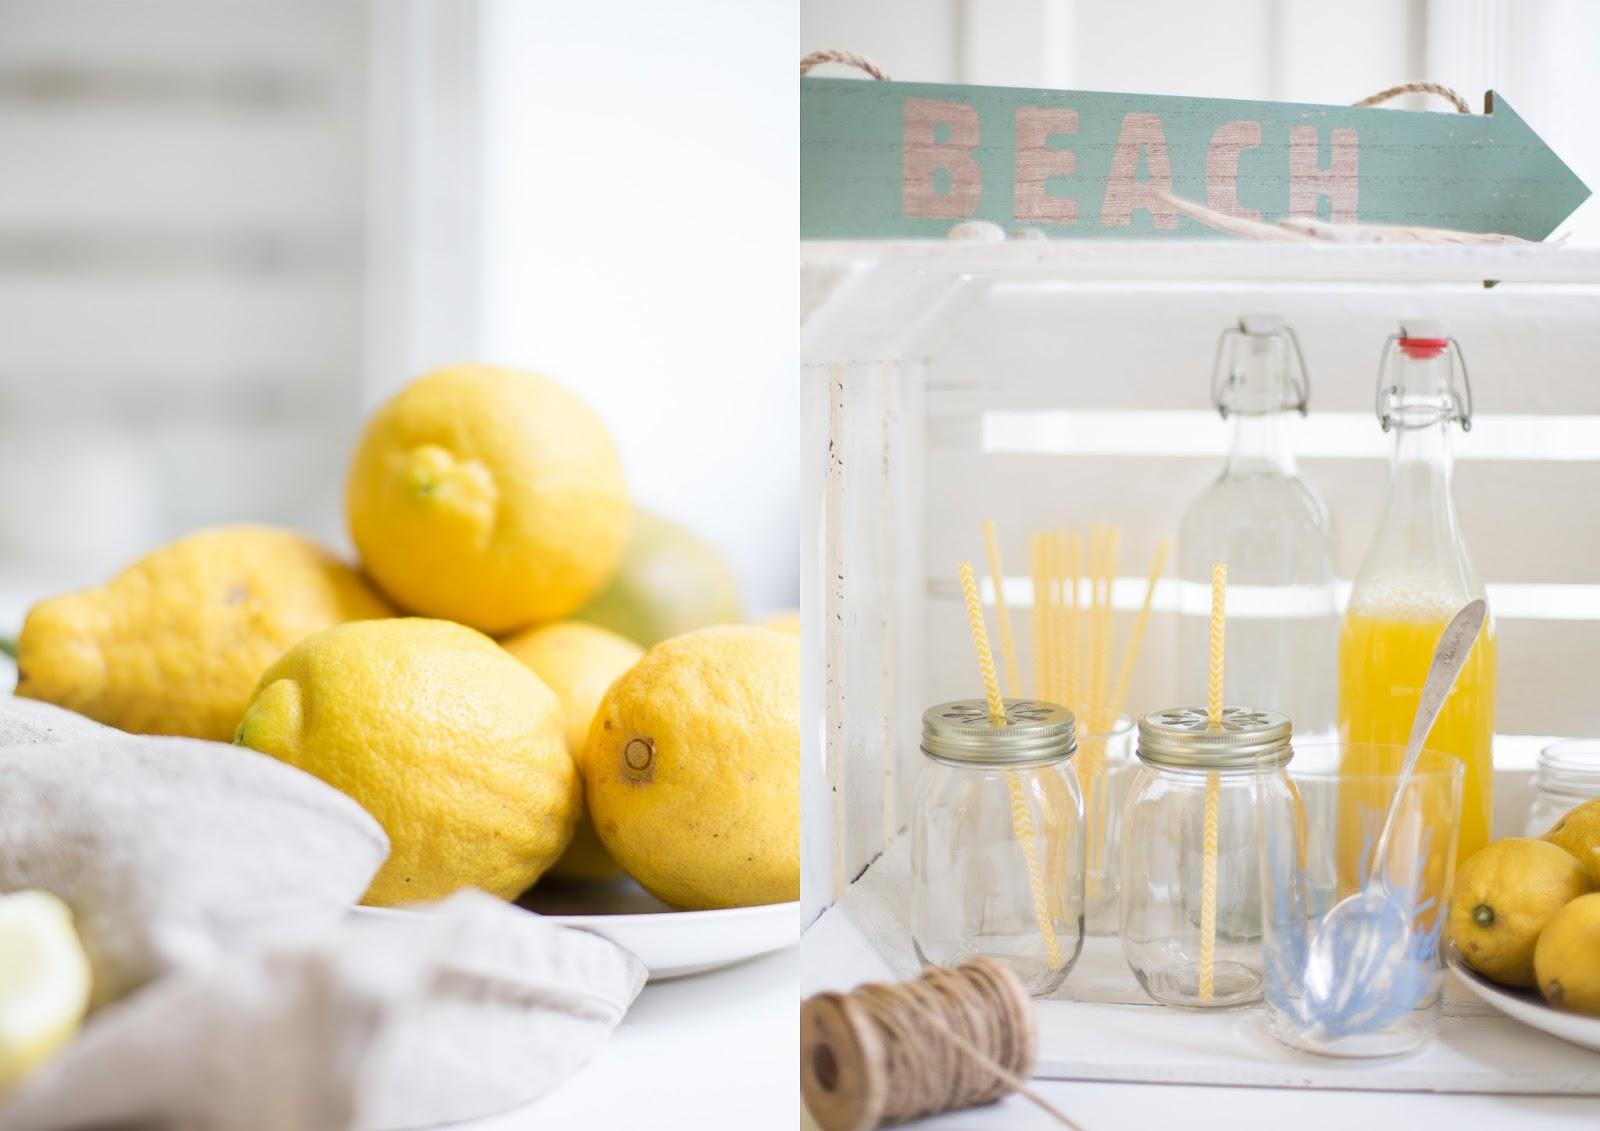 Mango-Zitronen-Limoande Rezept